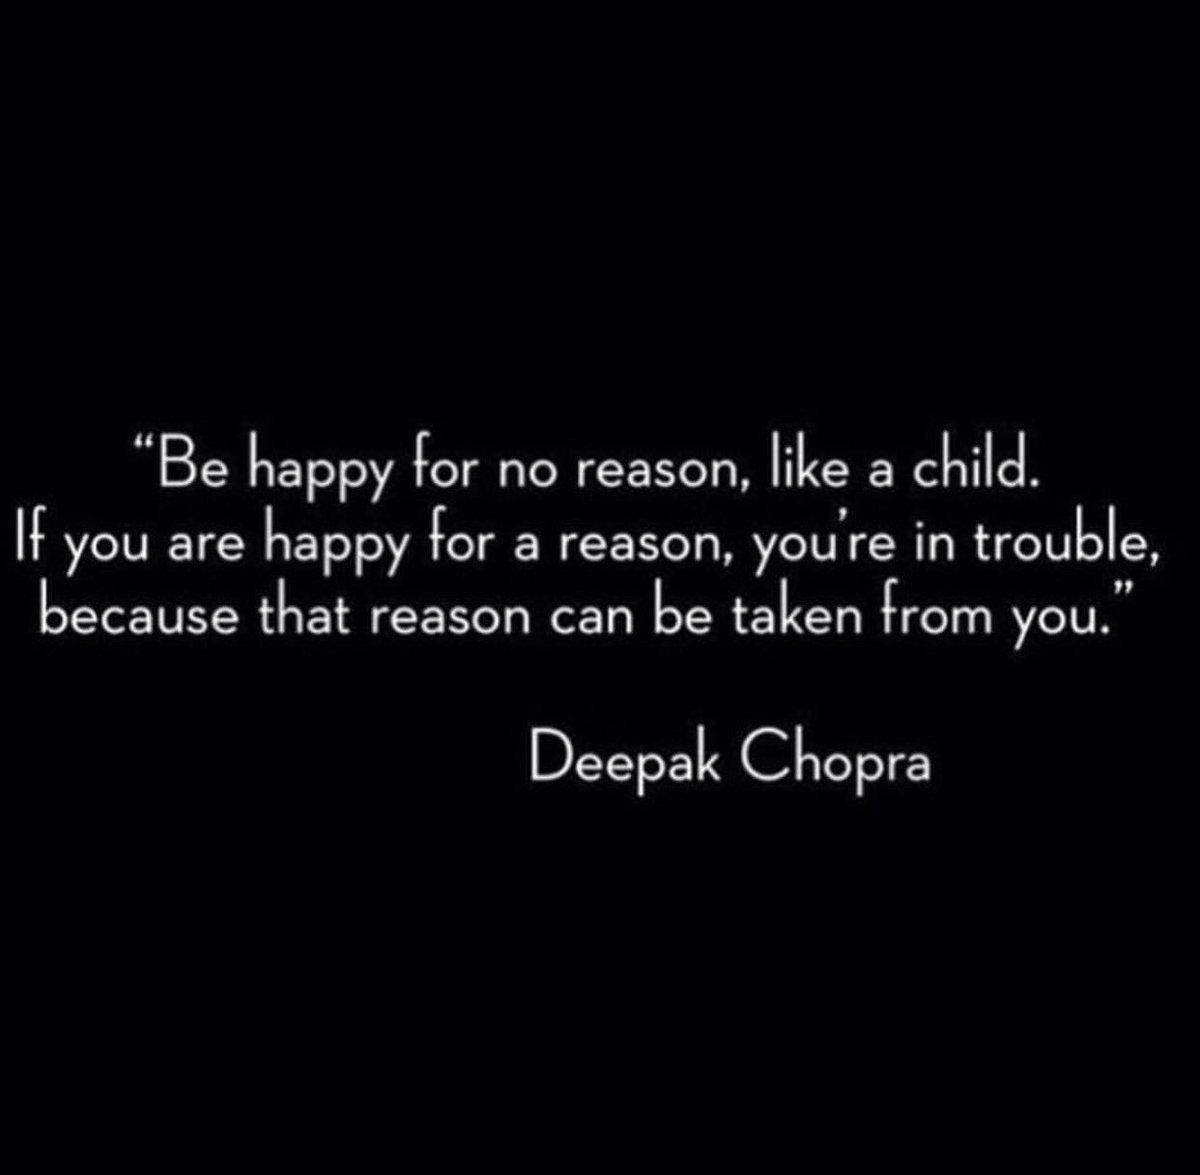 Be happy for no reason, like a child... #deepakchopra #innerpeace #love #lovelife #happy<br>http://pic.twitter.com/PqxzuXKVxe